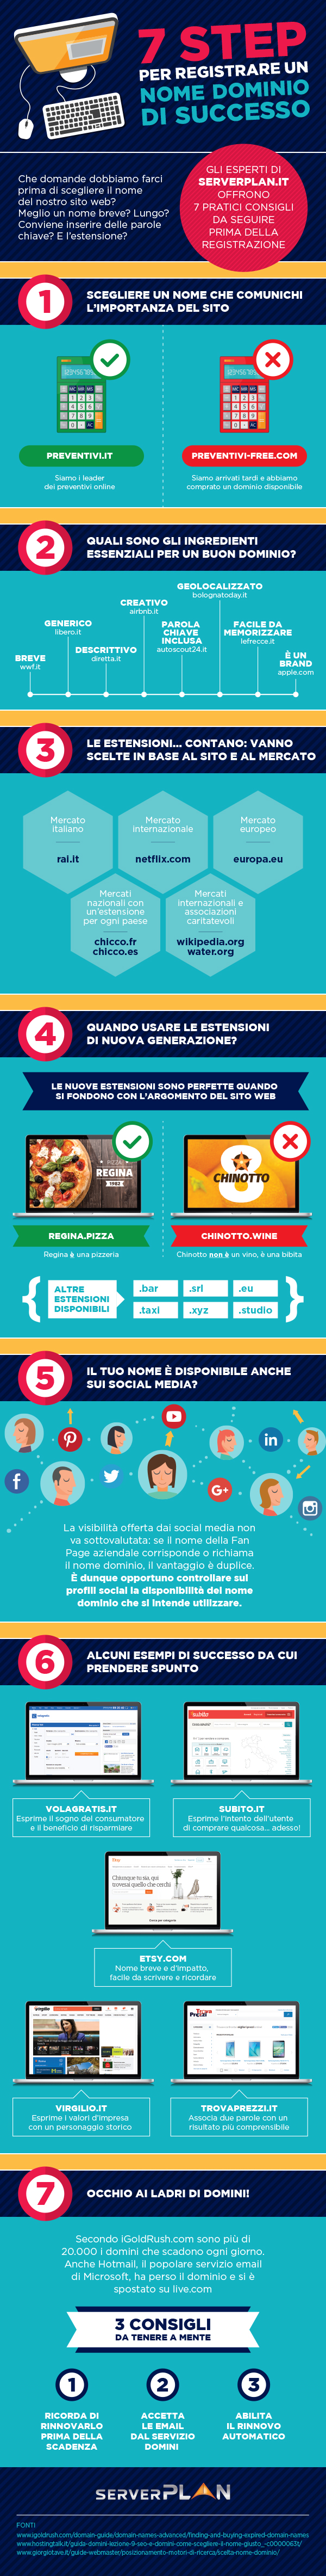 infografica-dominio-7-step-serverplan